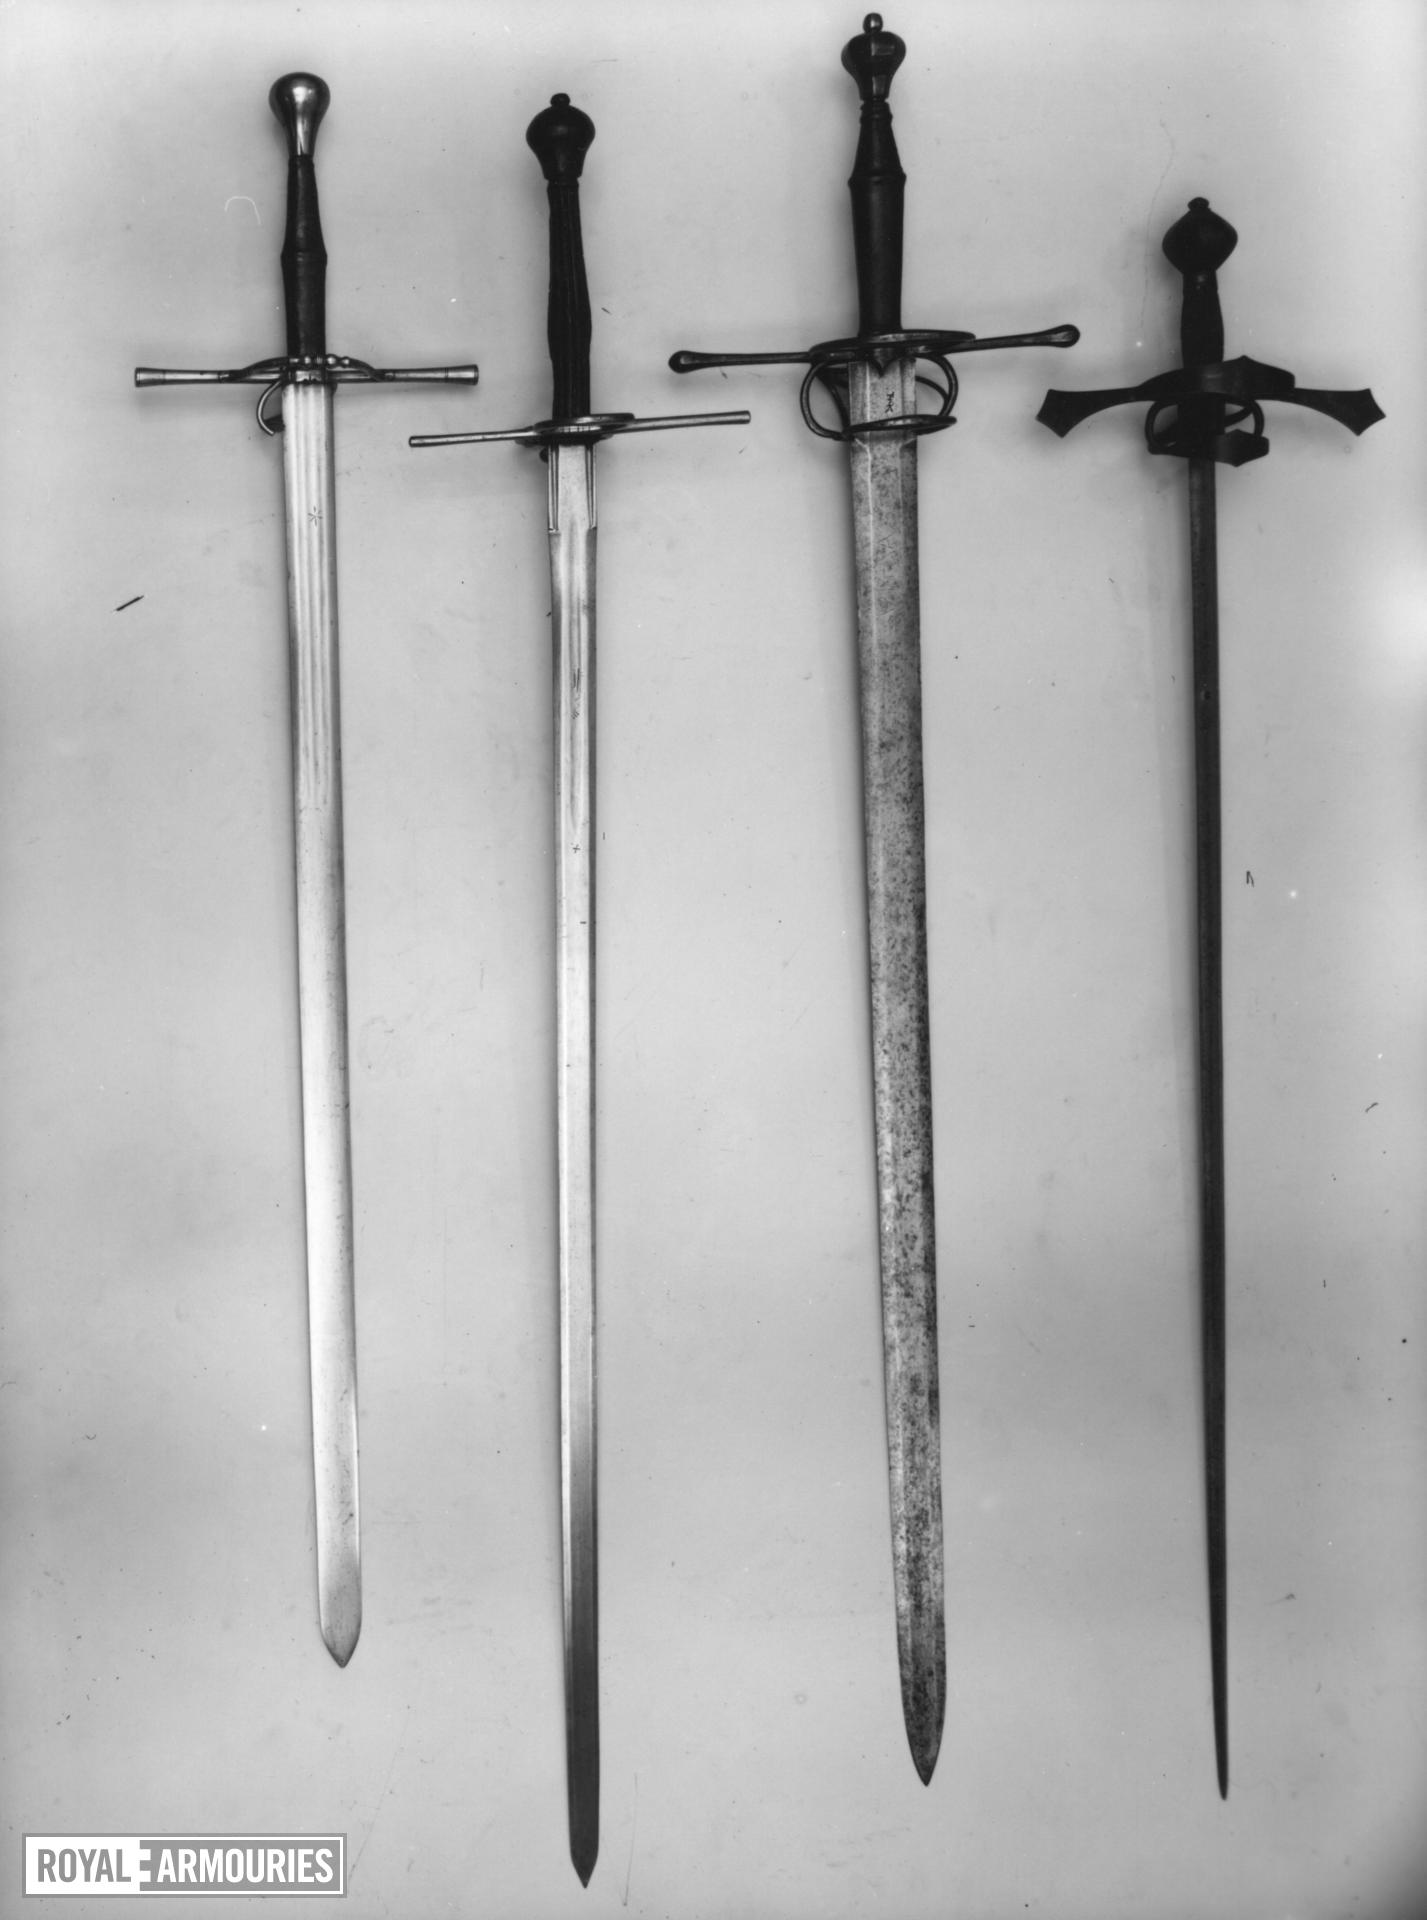 Sword - hand-and-a-half sword